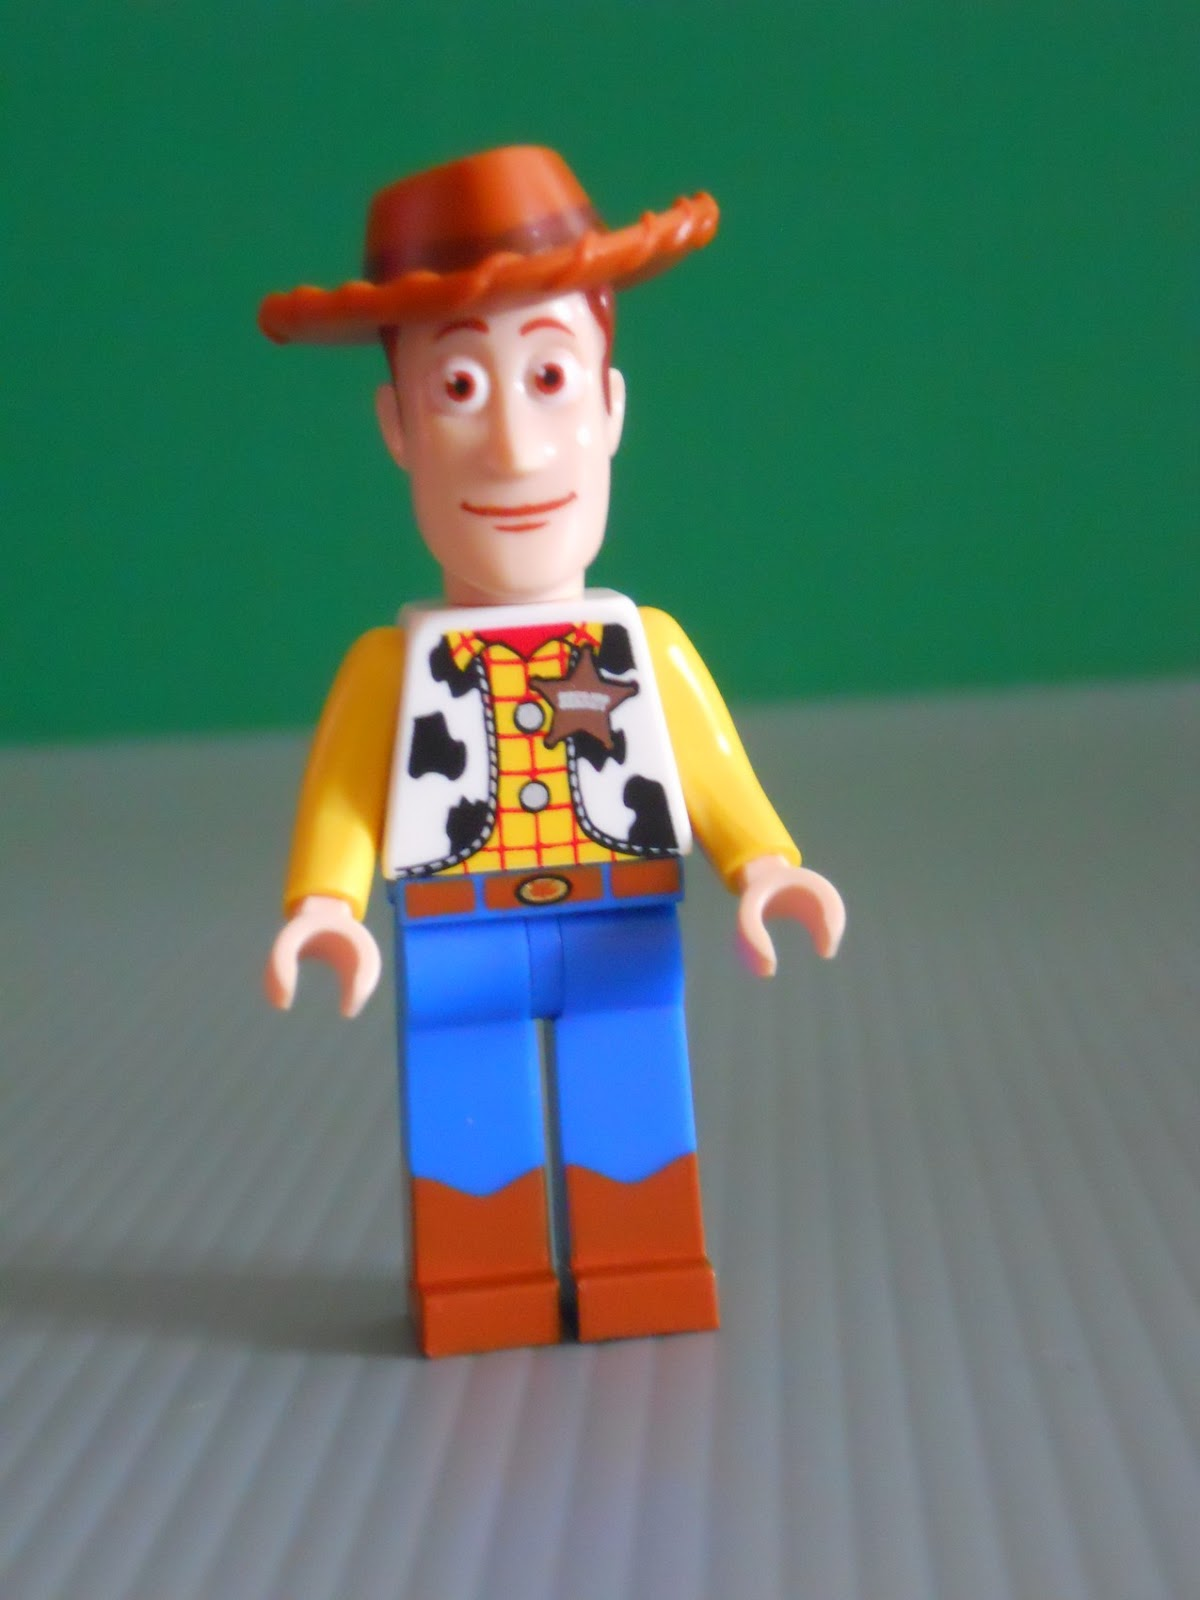 Lego Toy 3 : Dexters diecasts dexdc lego toy story minifigure woody